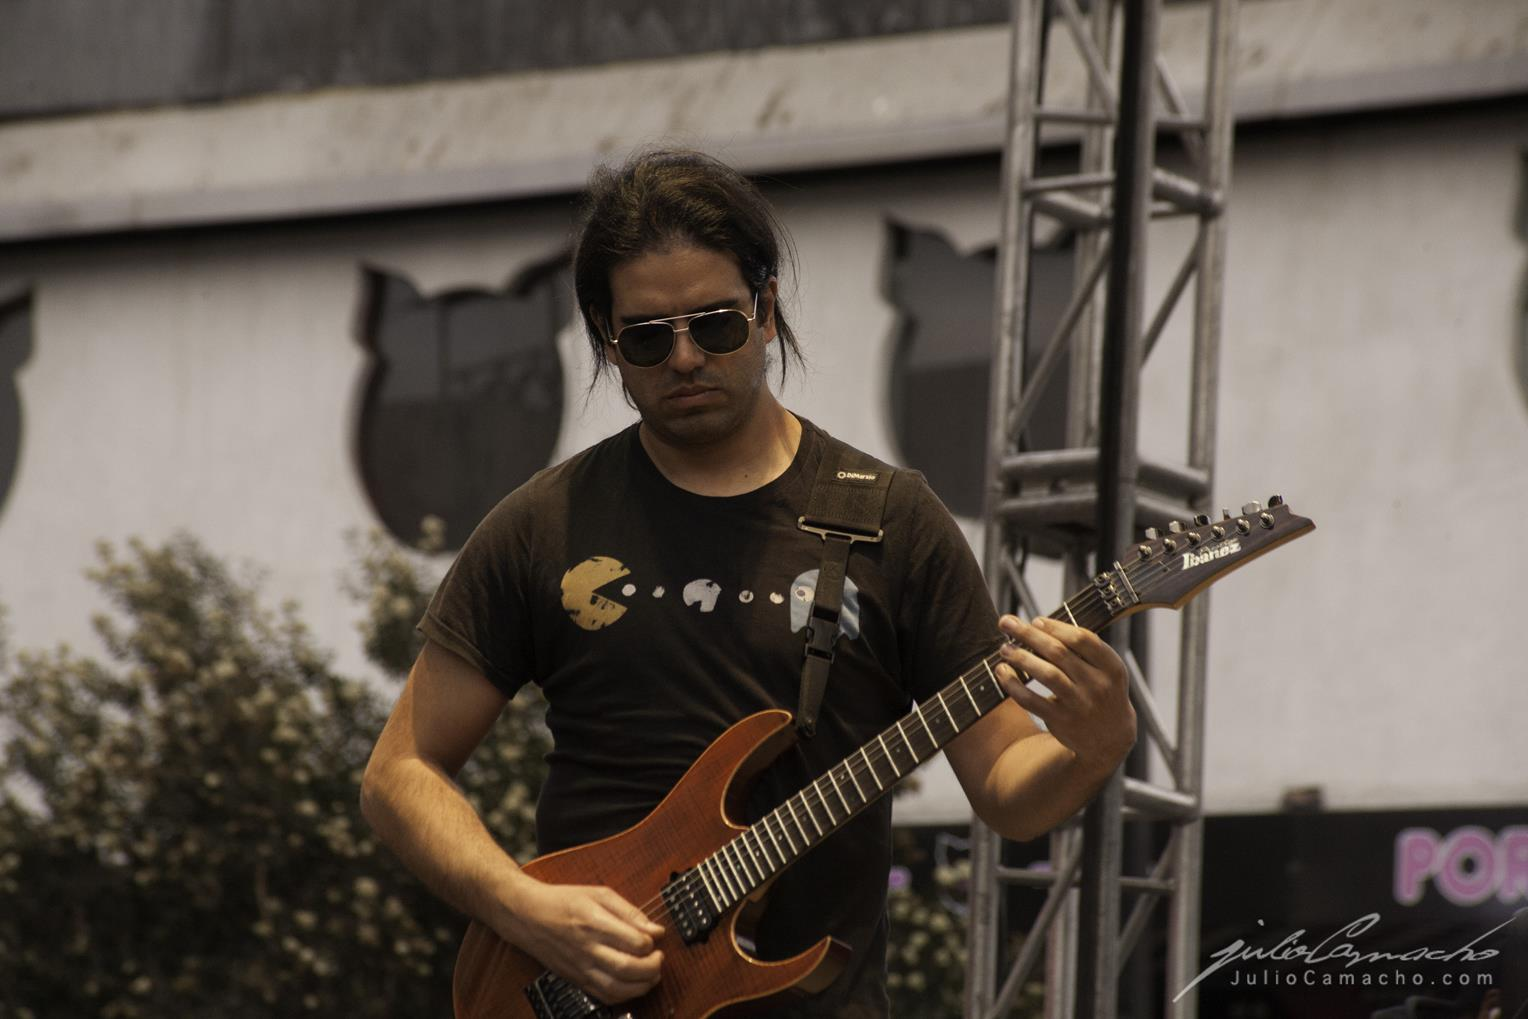 2014-10-30 31 CAST TOUR Ensenada y Tijuana - 1222 - www.Juli (Copy).jpg